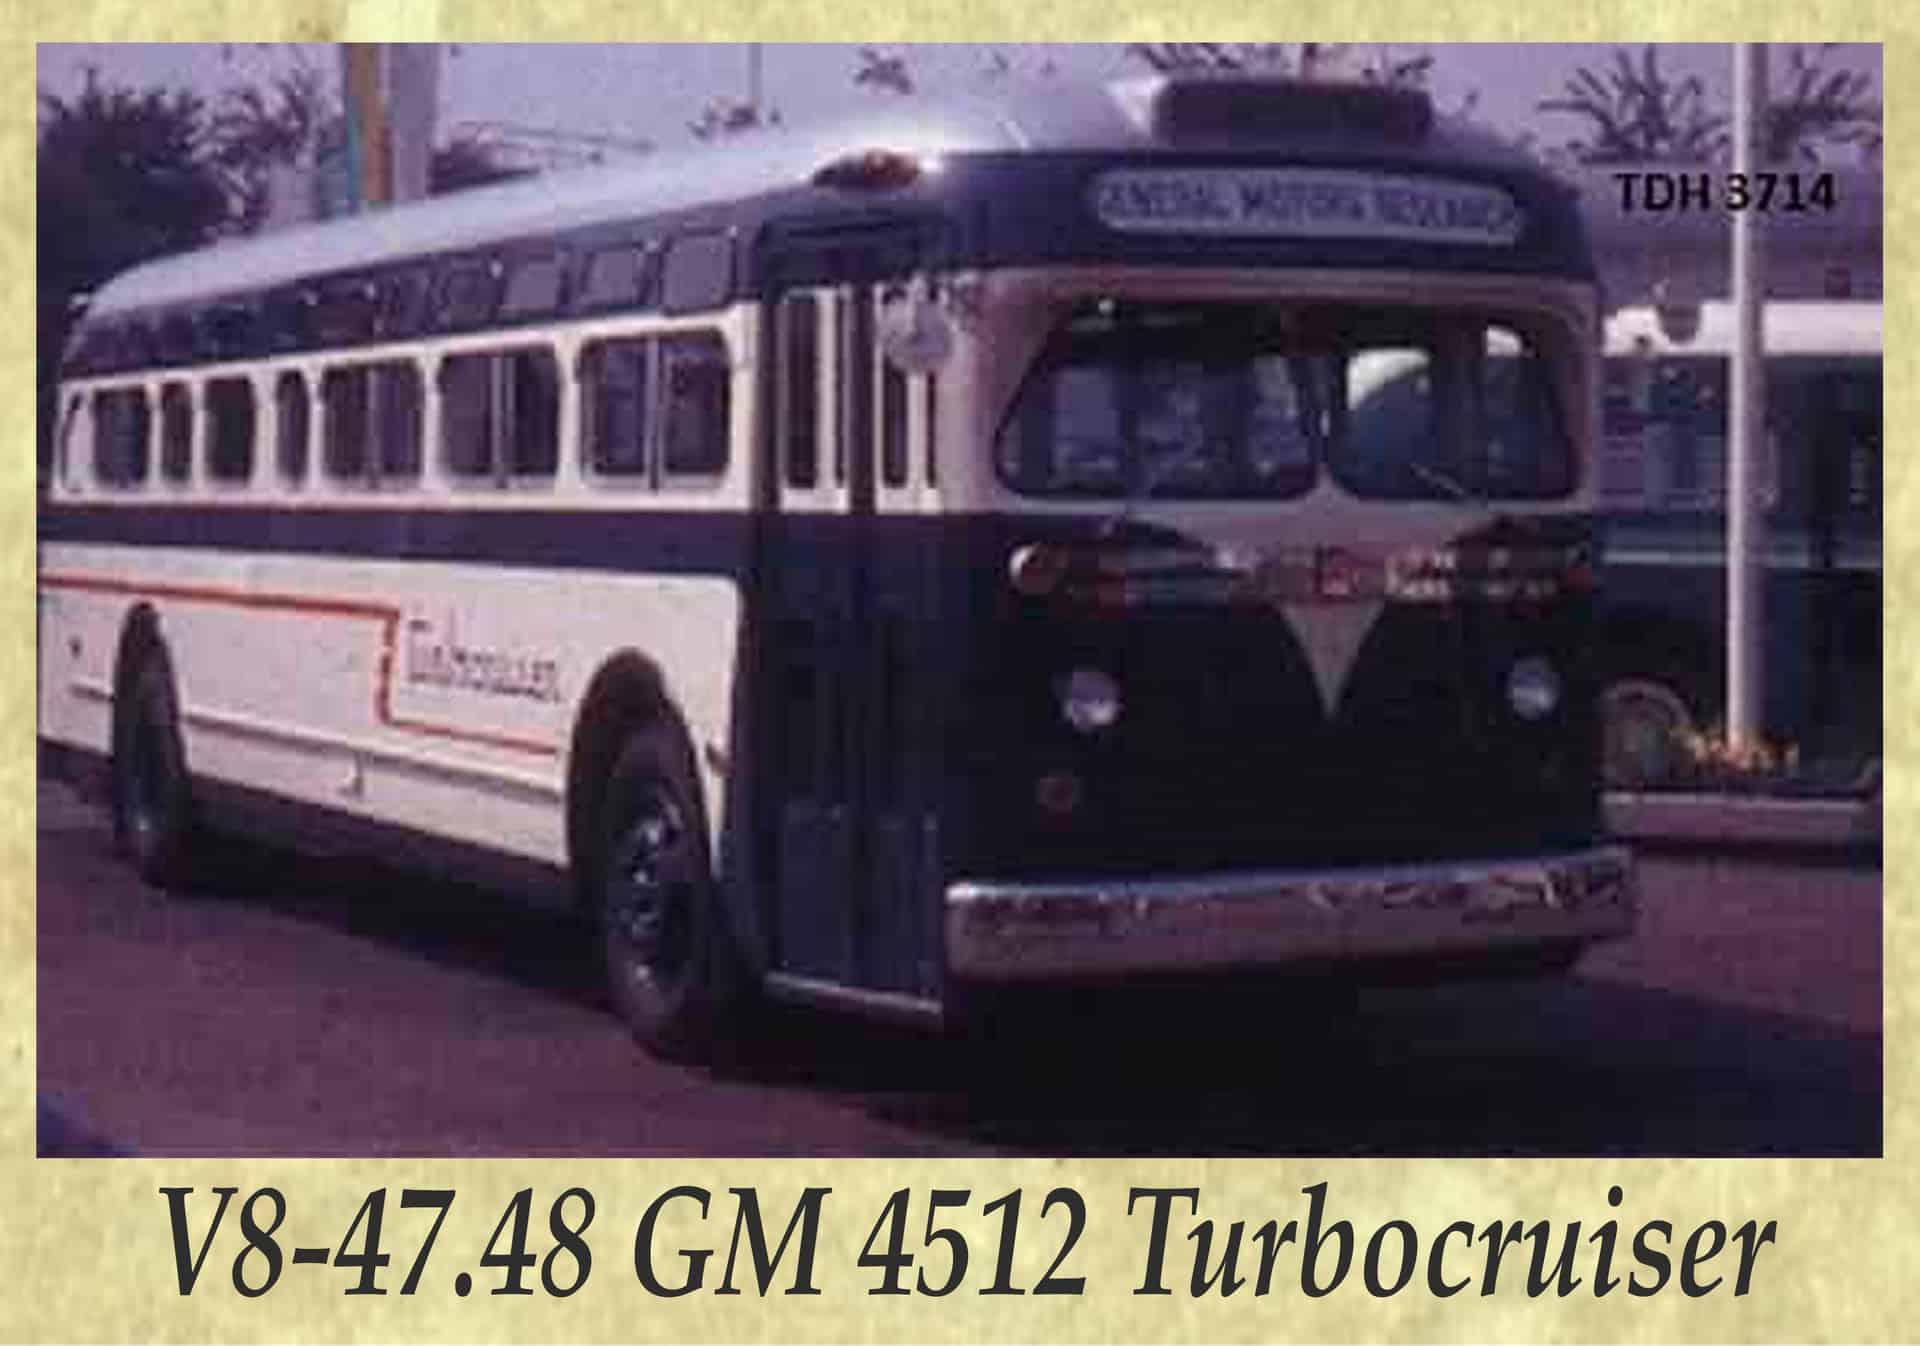 V8-47.48 GM 4512 Turbocruiser